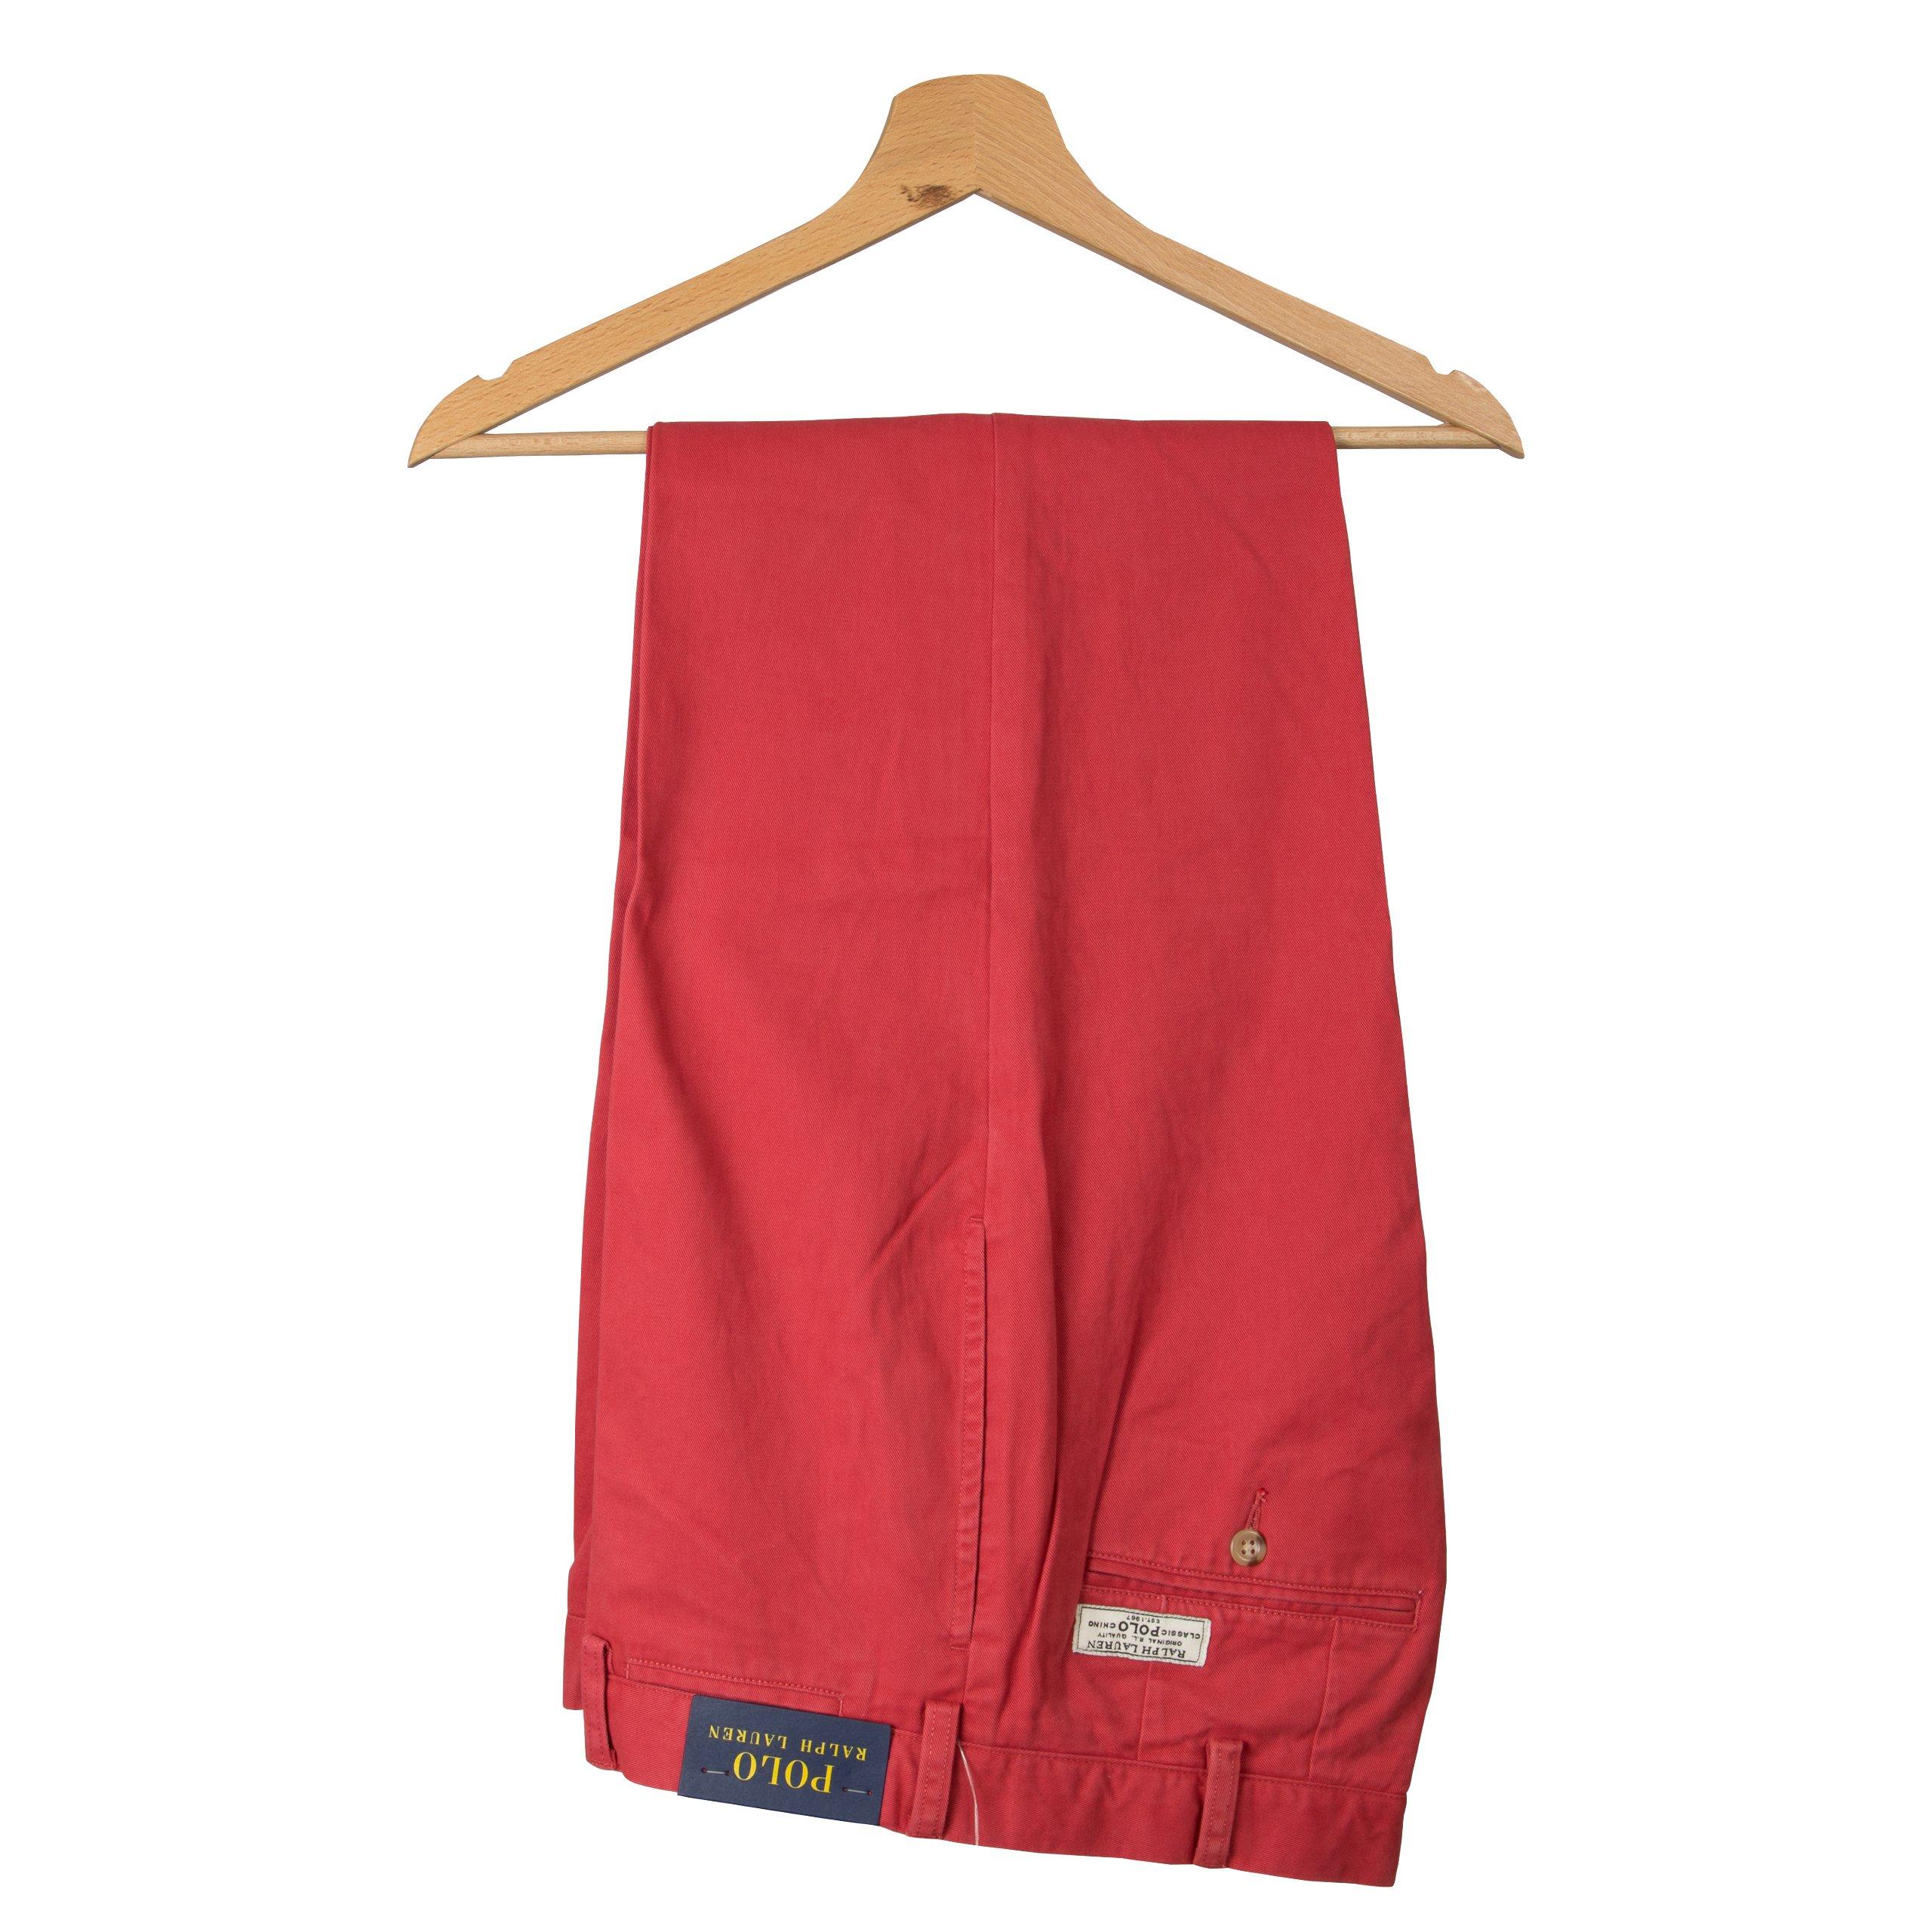 14a5299a4 POLO RALPH LAUREN spodnie męskie CHINOS 34/32 6806708446 - Allegro.pl